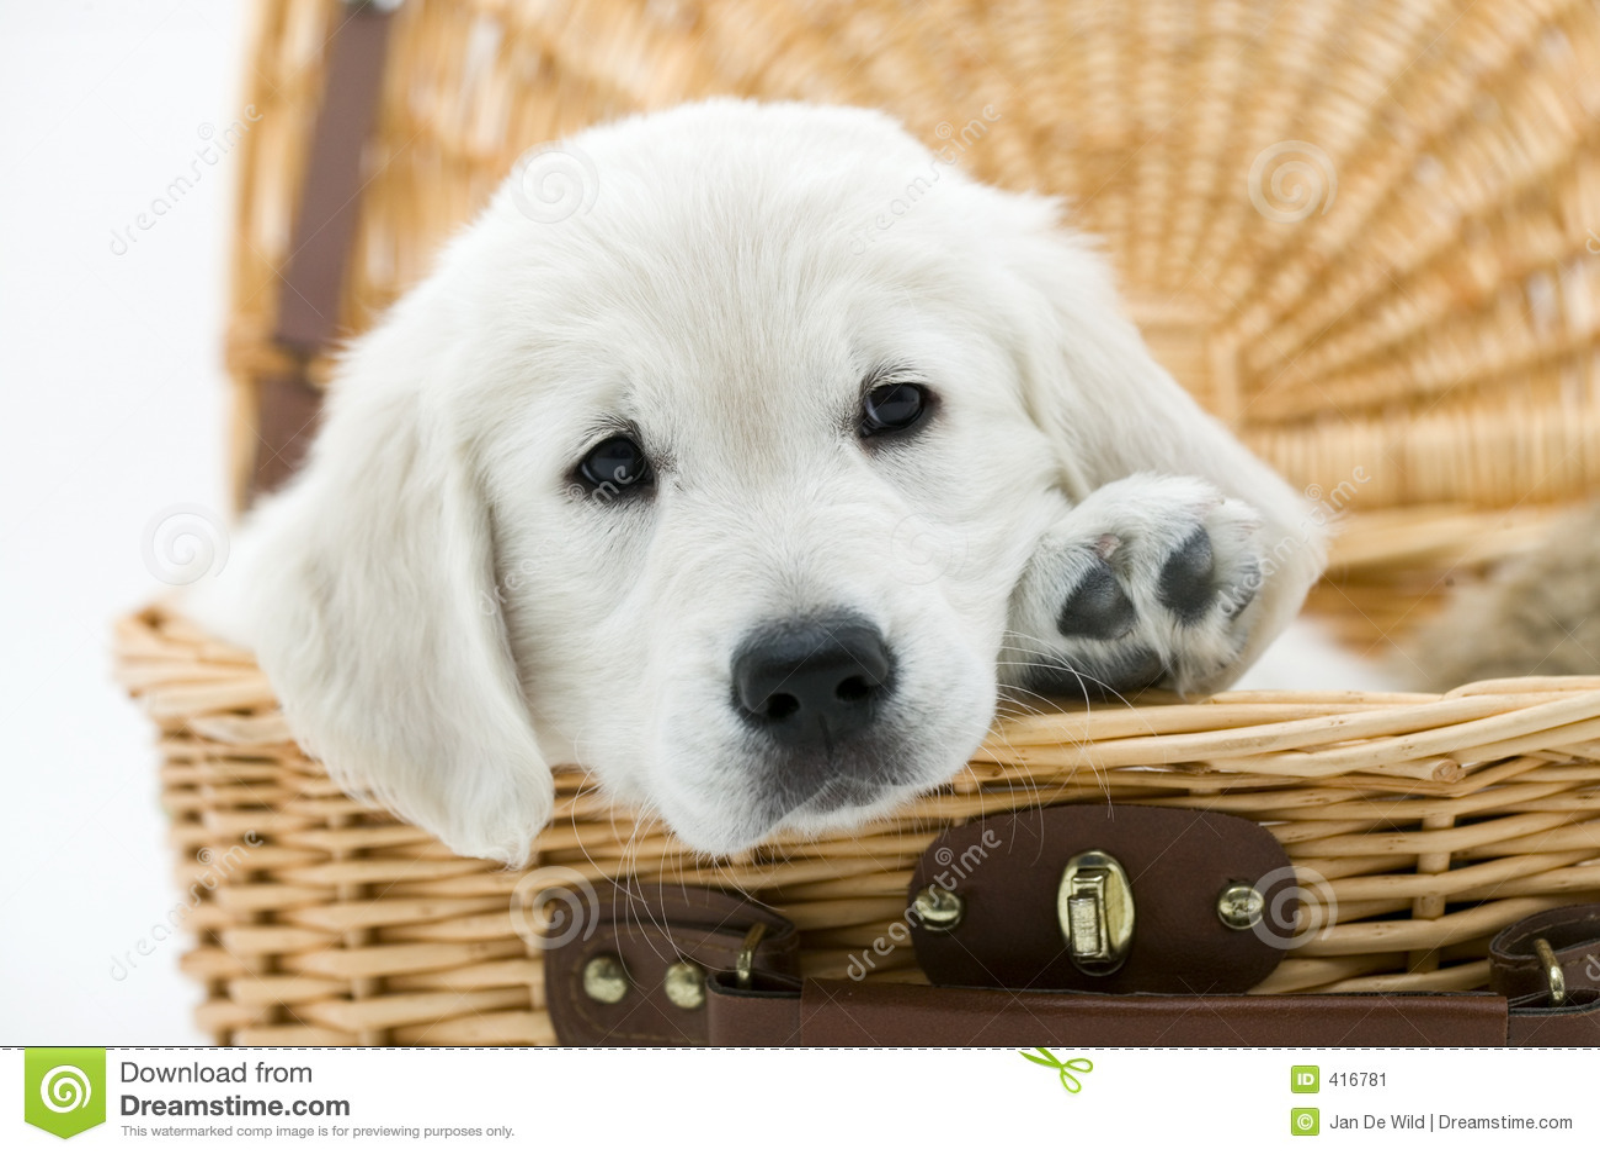 Dog In A Basket Stock Image Image 416781